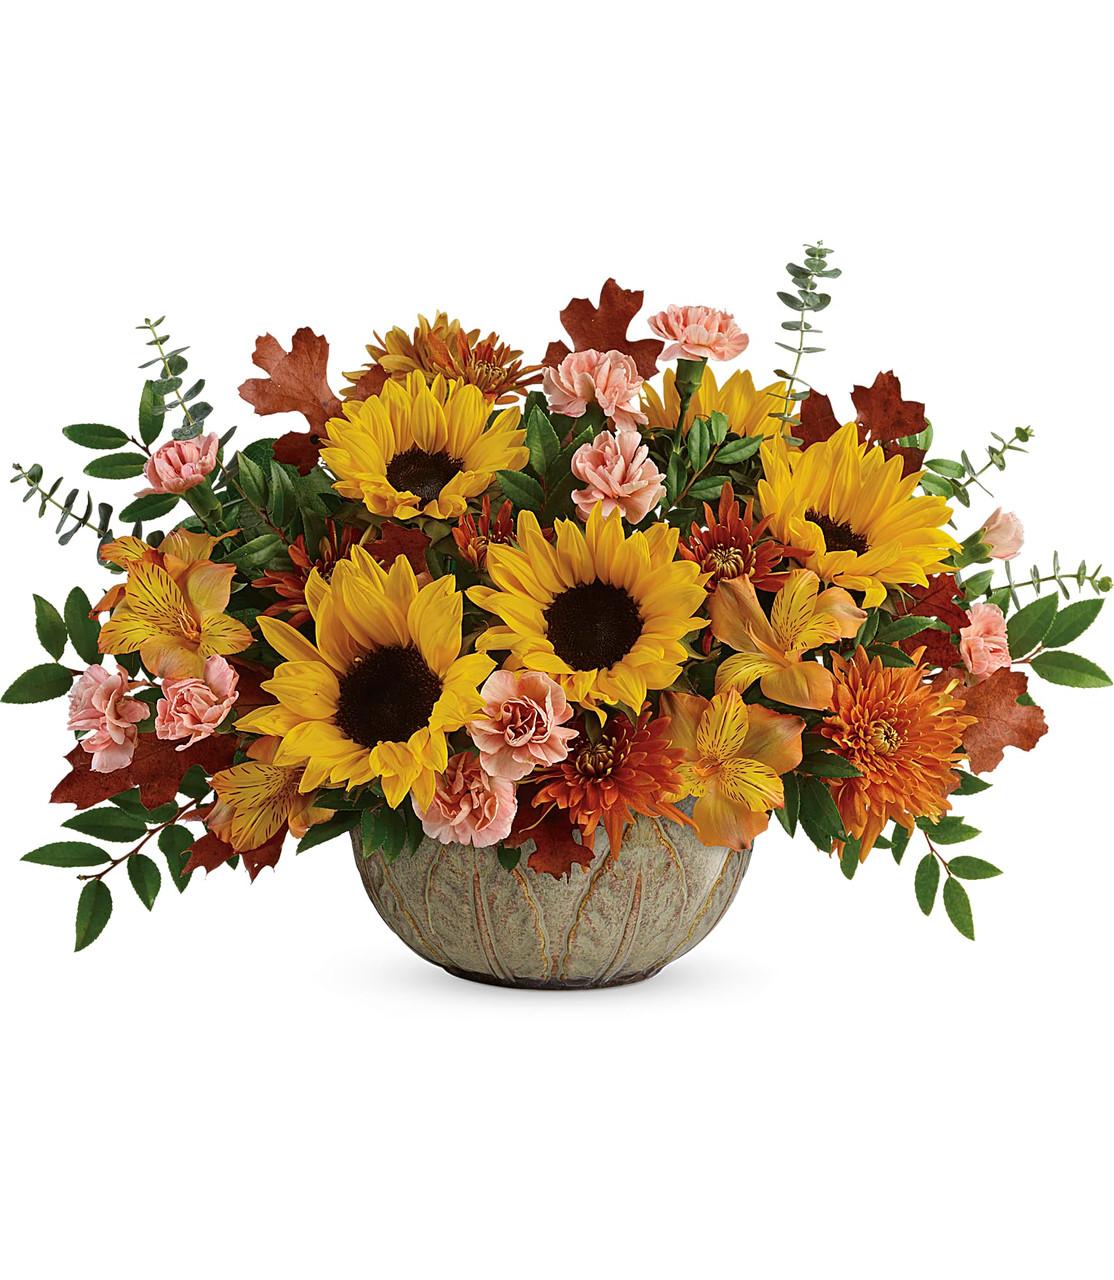 Amazing Autumn Sunbeams Sunflower Bouquet